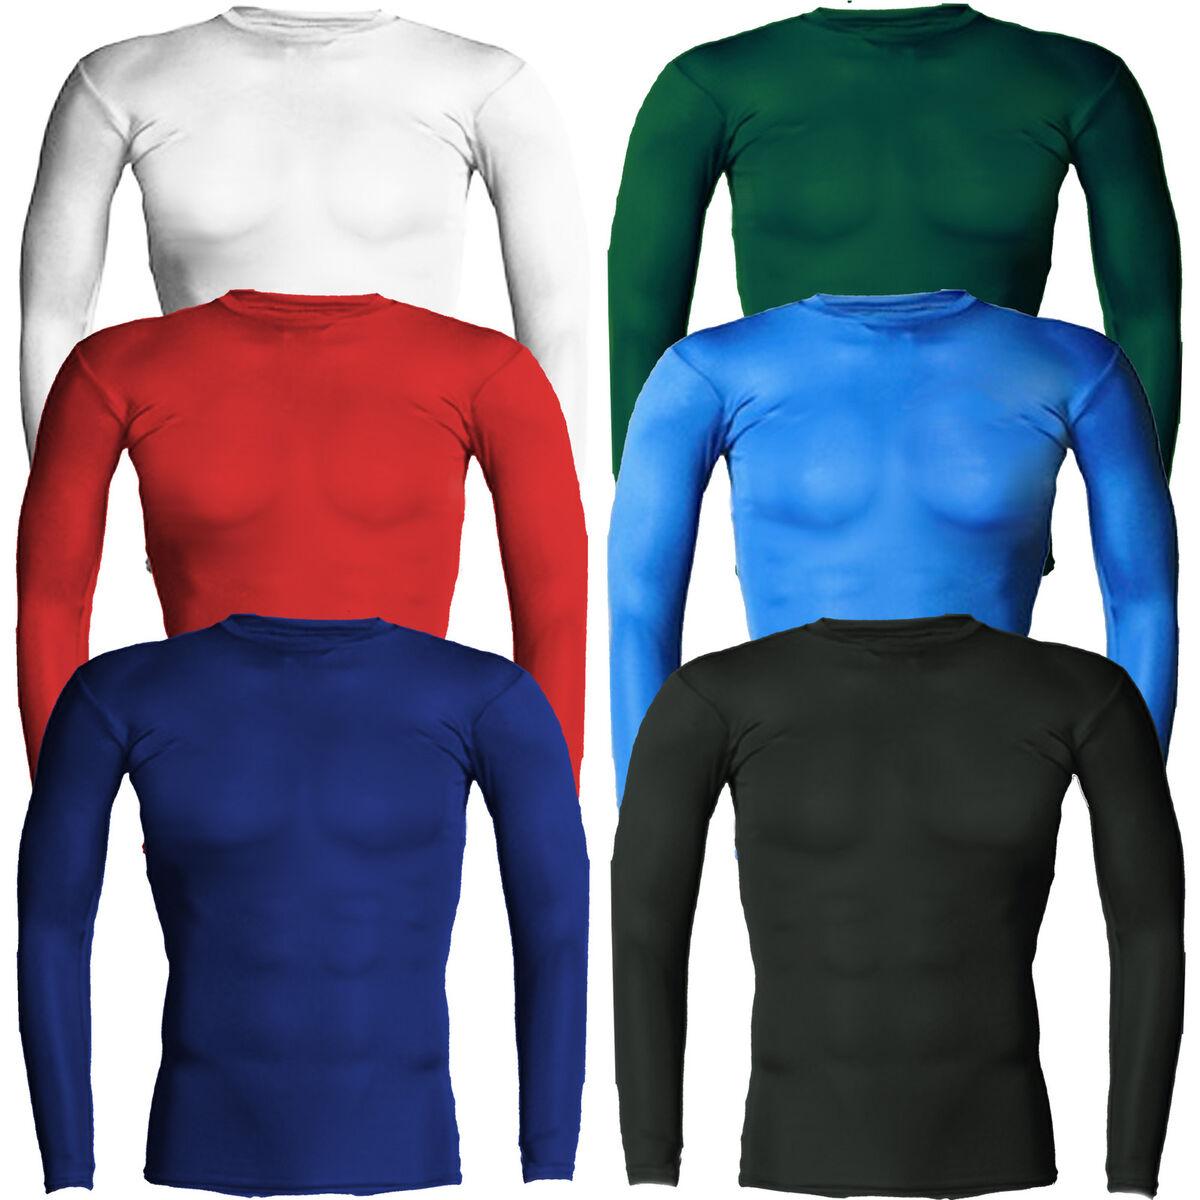 Mens Pro Rash Guard Long Sleeve MMA Compression Shirt Surf Shirt